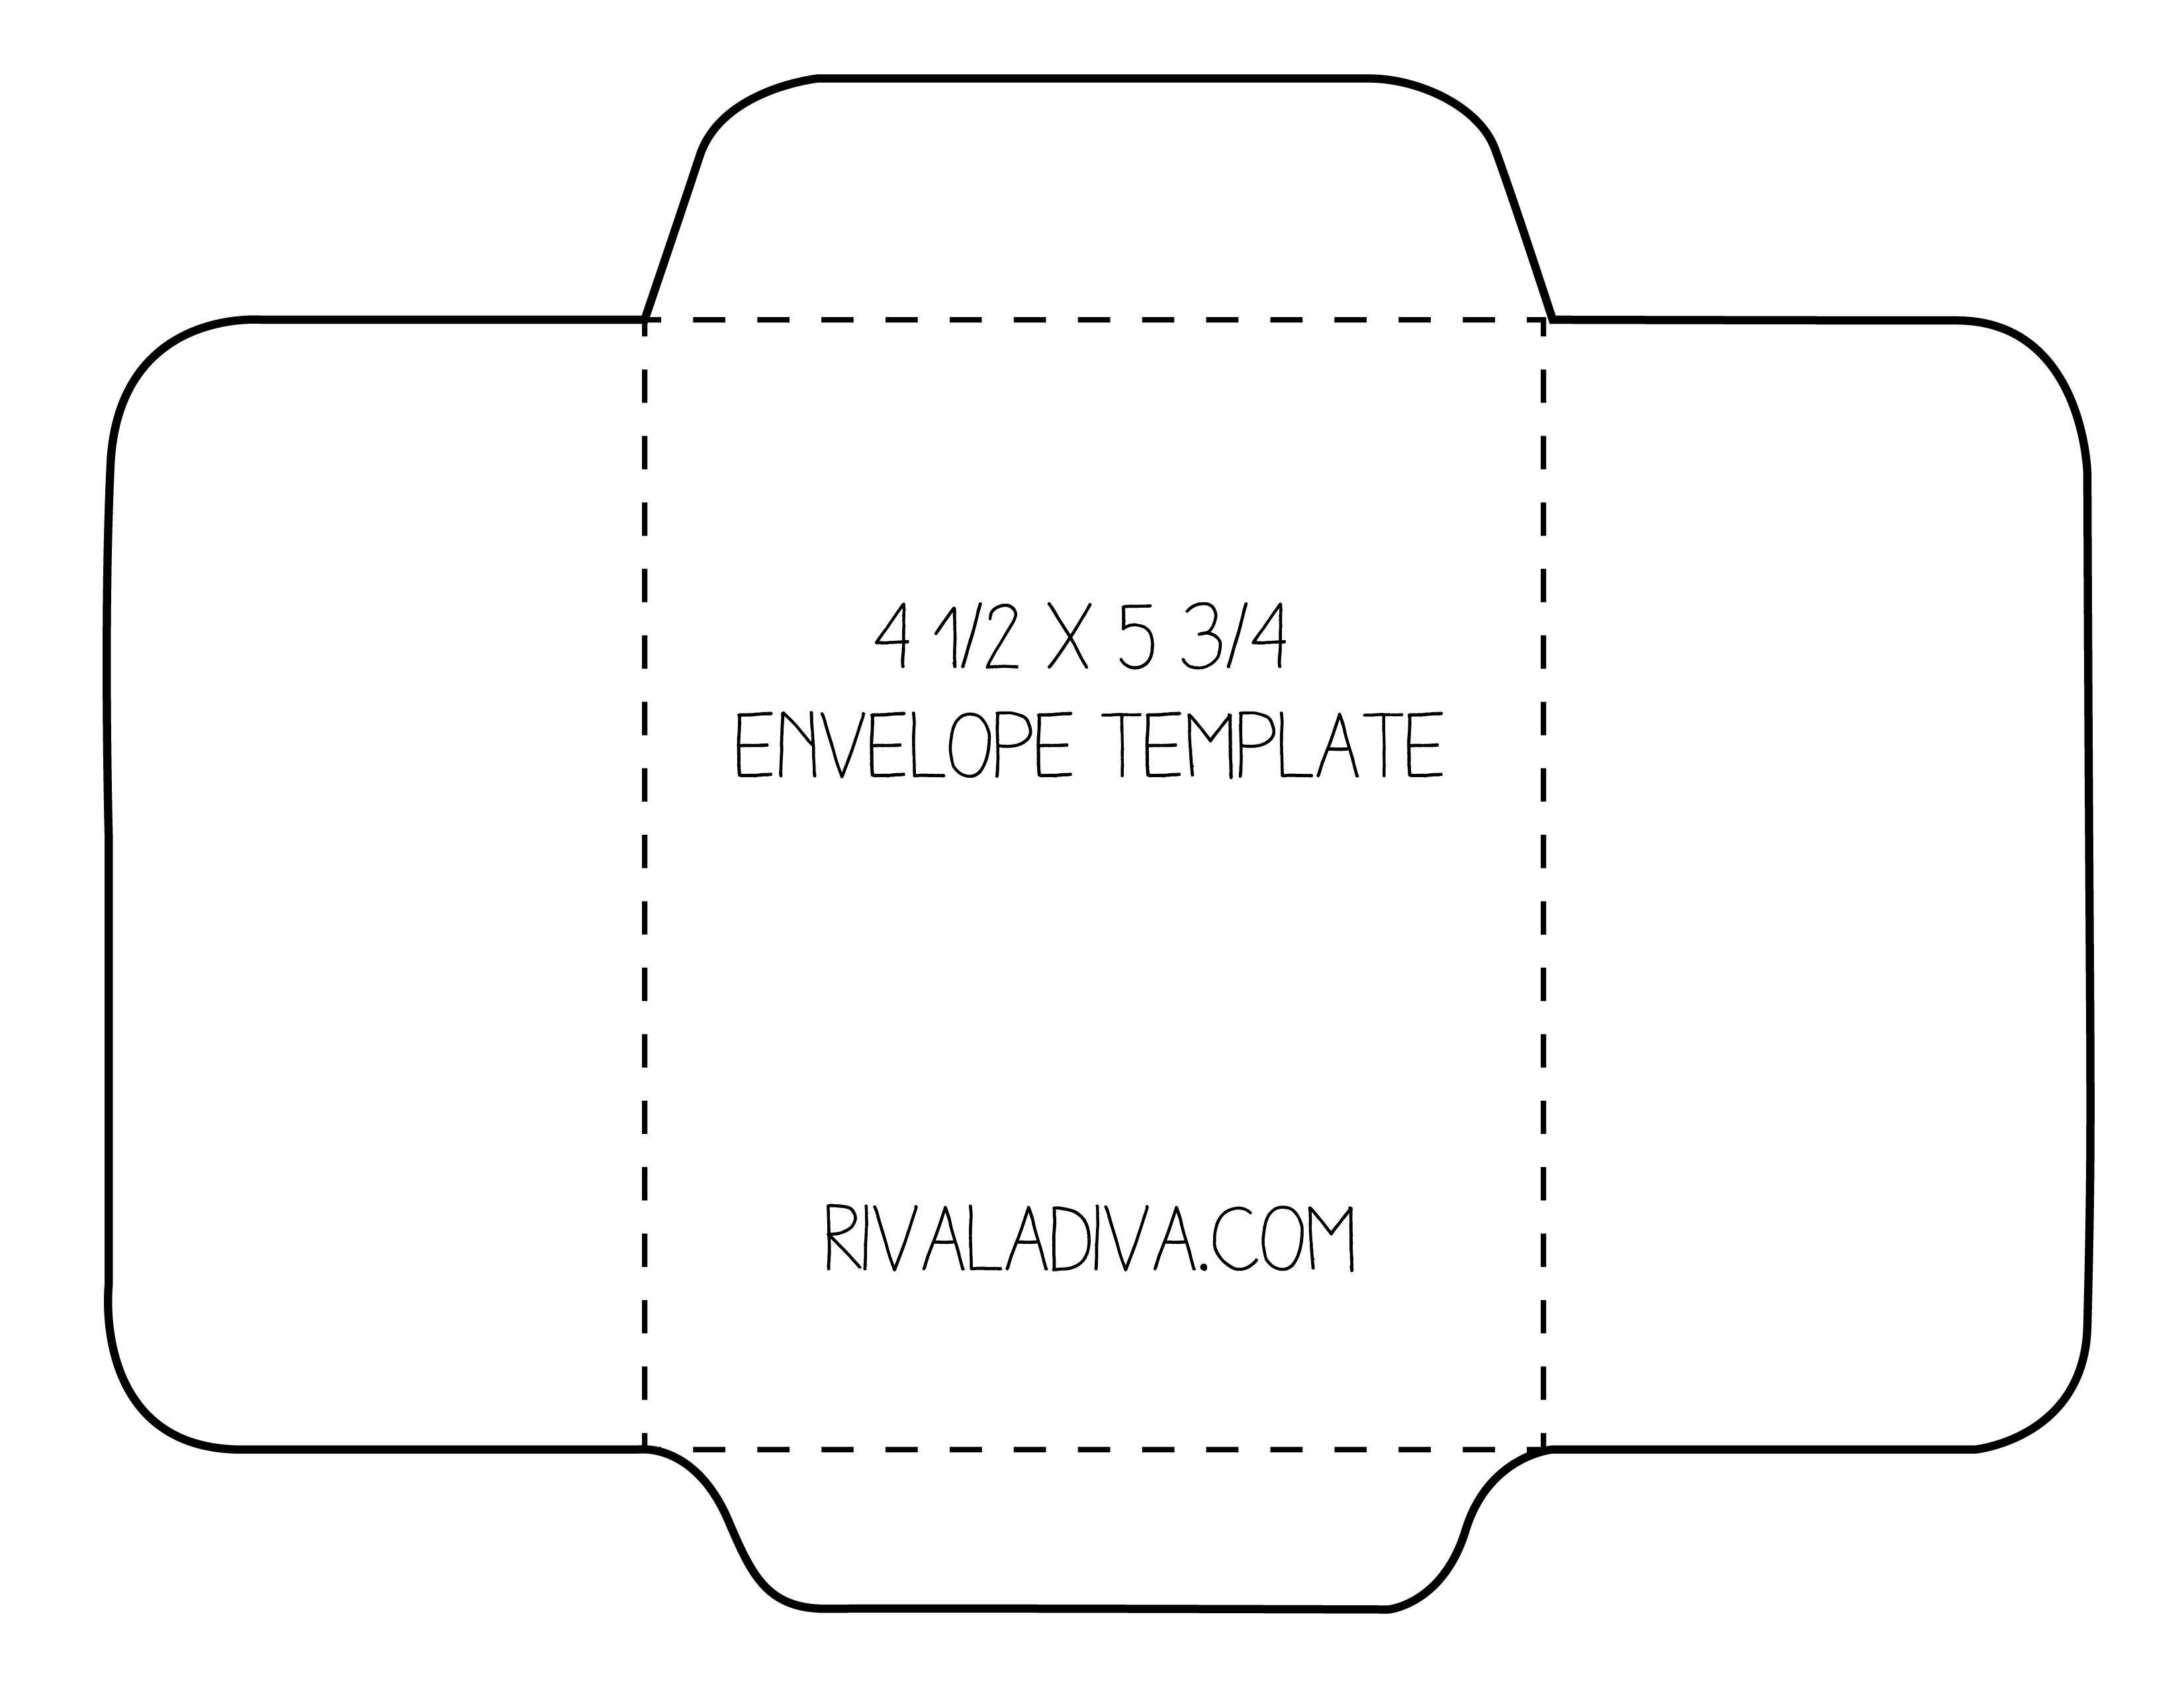 Envelope Template   Envelope Template For 8.5 X 11 Paper Diy - Free Printable Envelope Size 10 Template